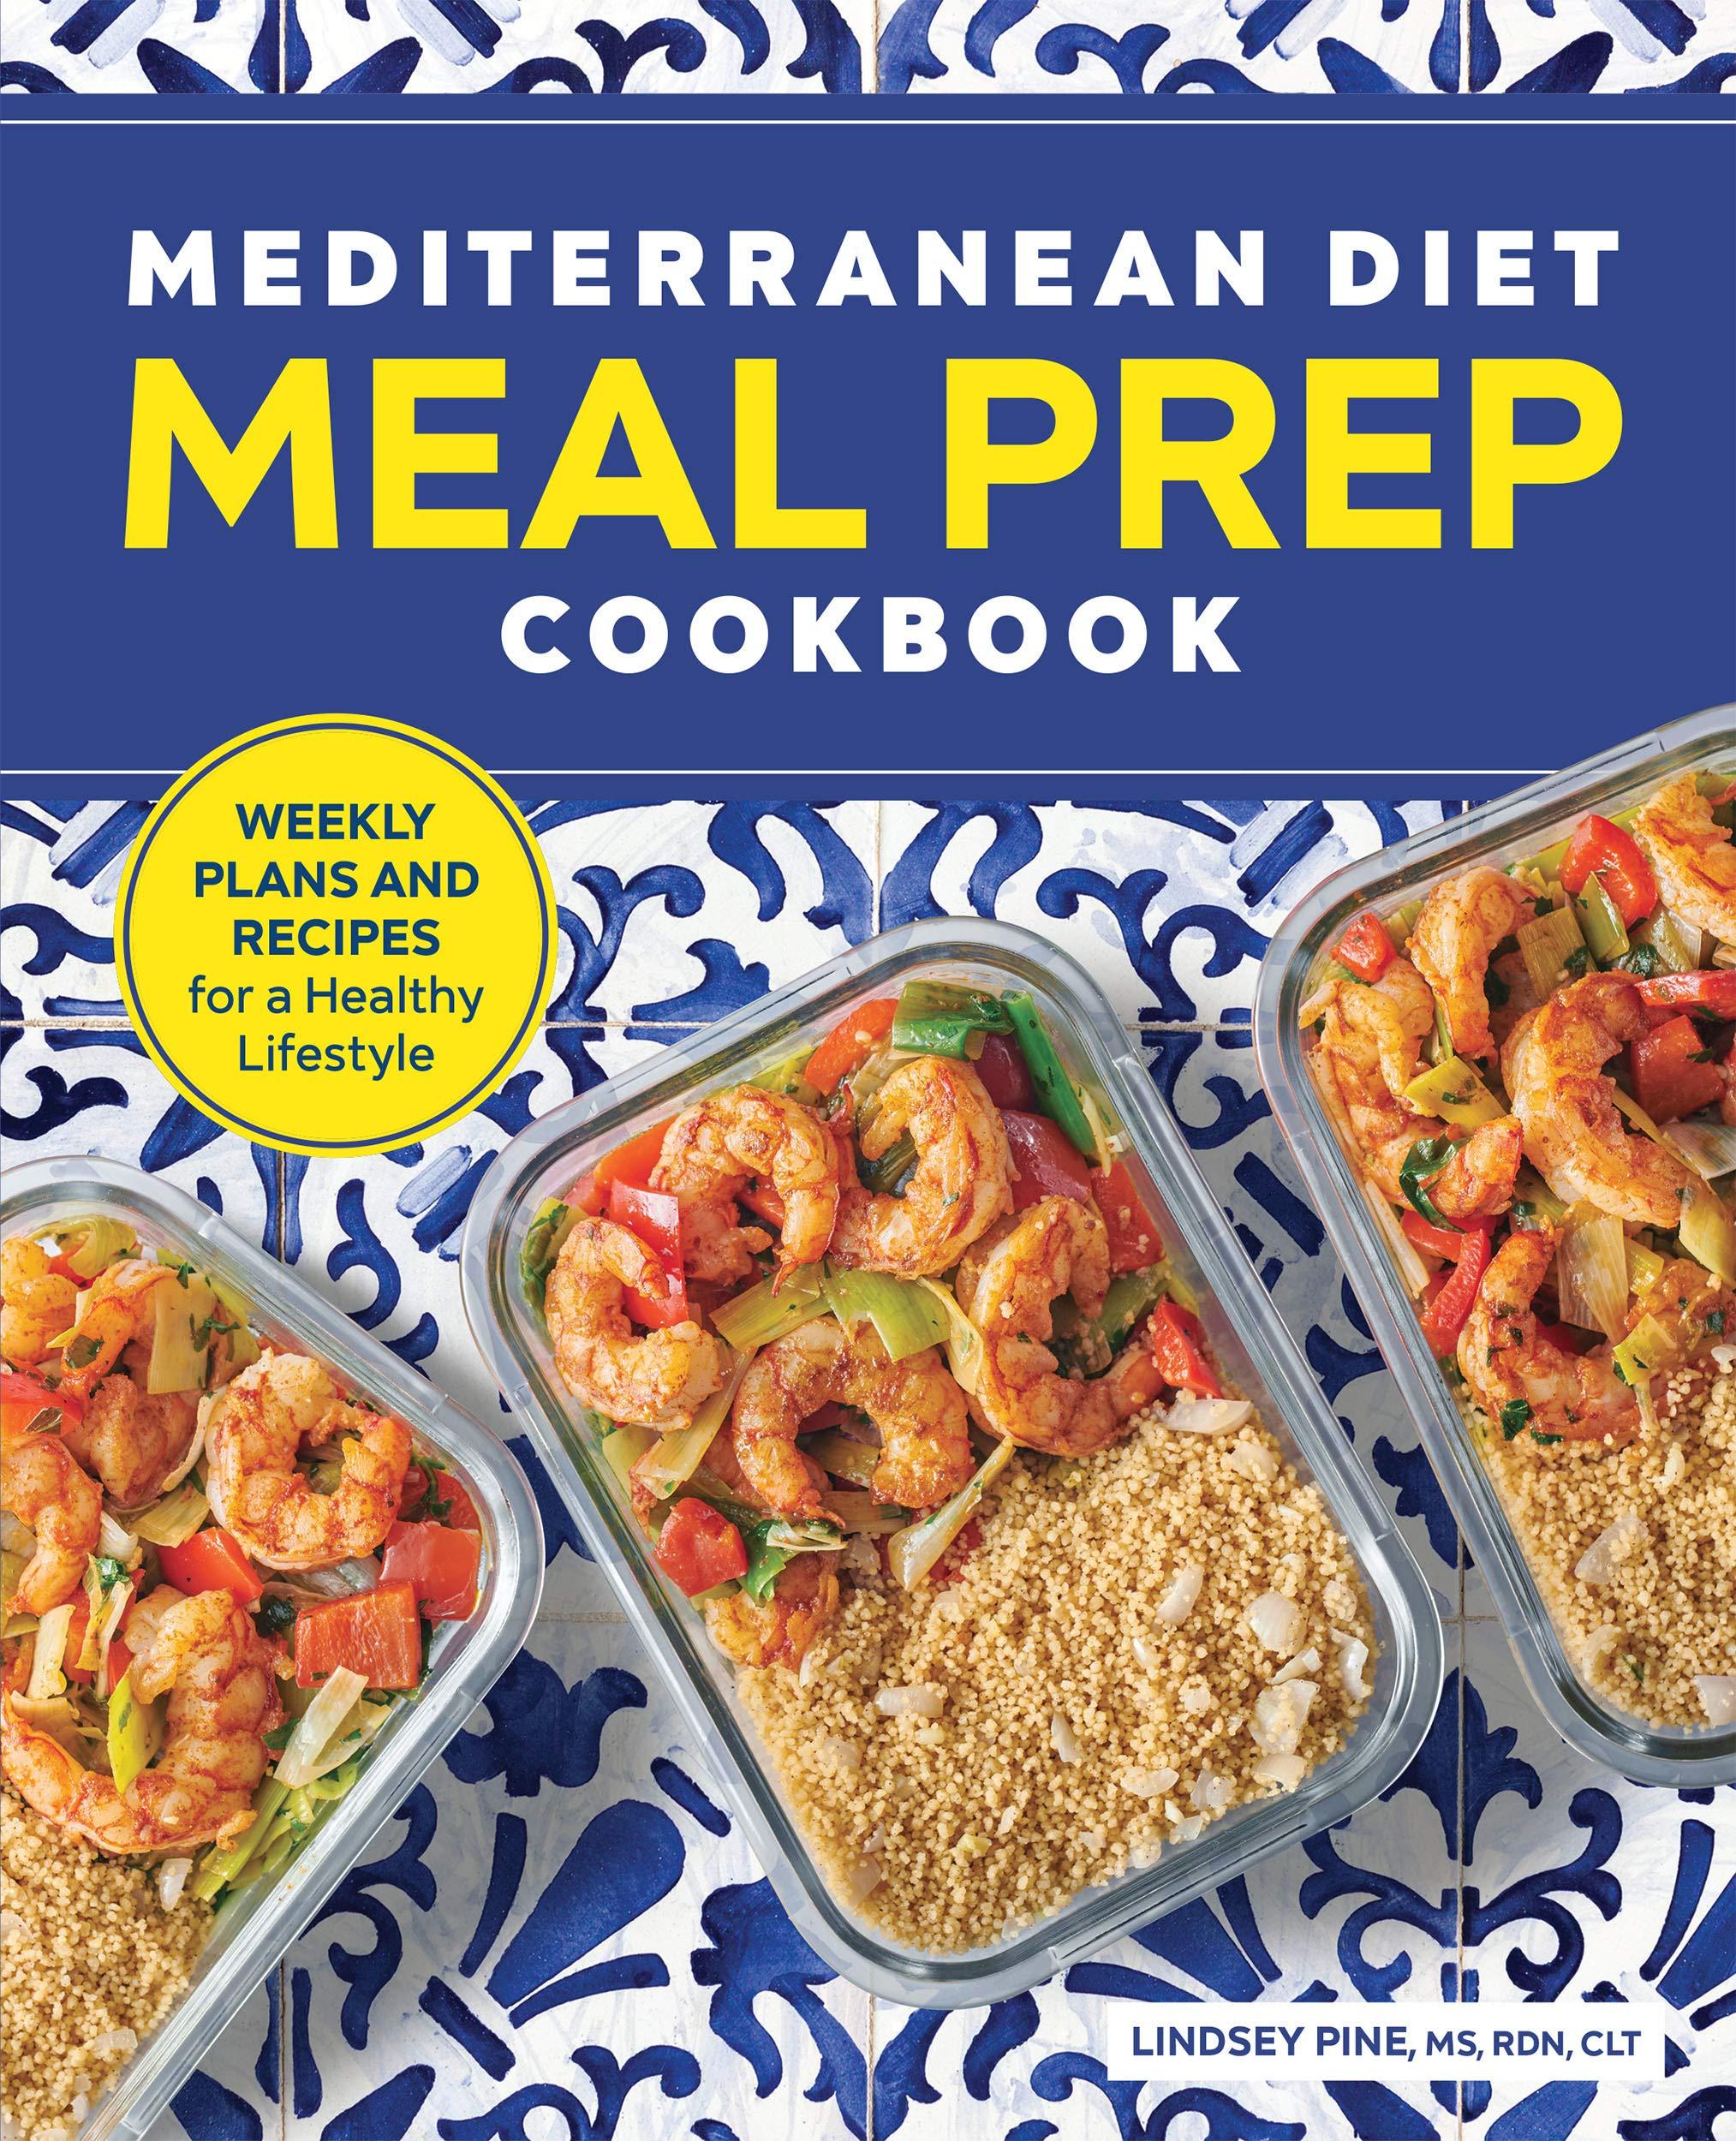 buy mediterranean diet meals delivered